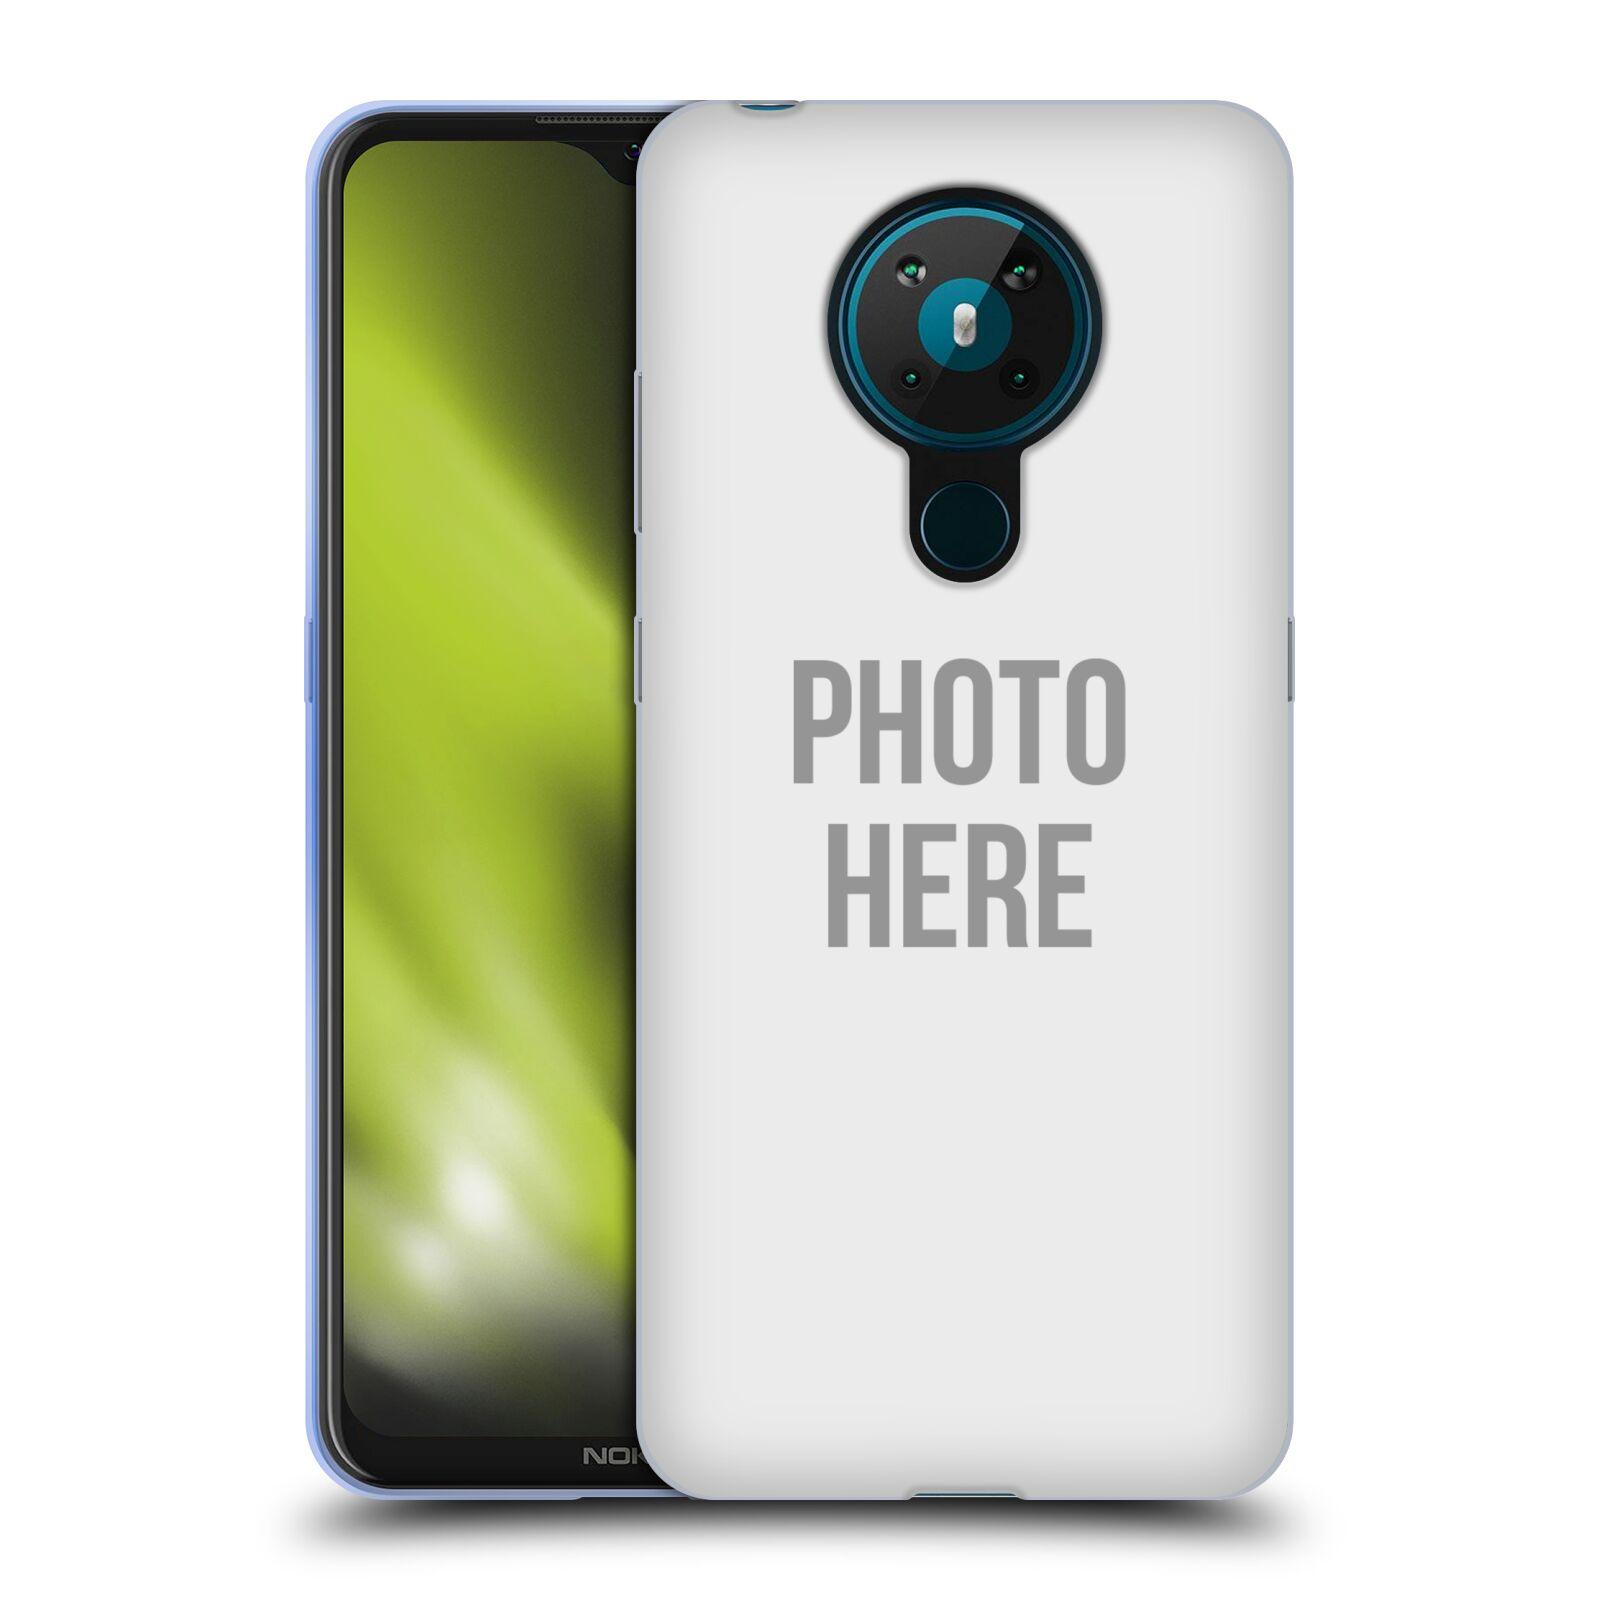 Silikonové pouzdro na mobil Nokia 5.3 s vlastním motivem